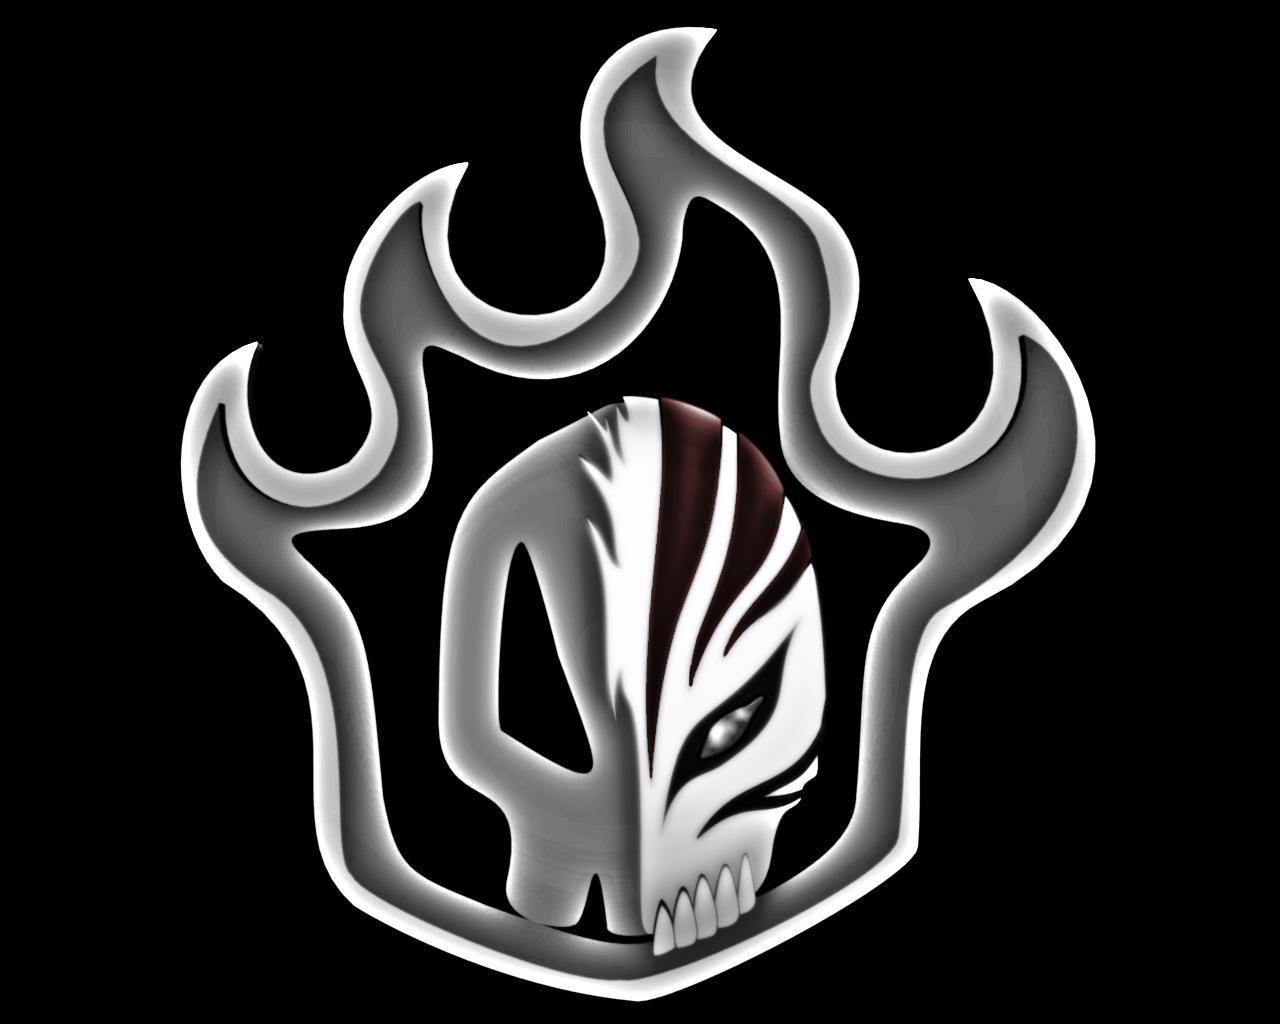 Bleach Flaming Skull Logo